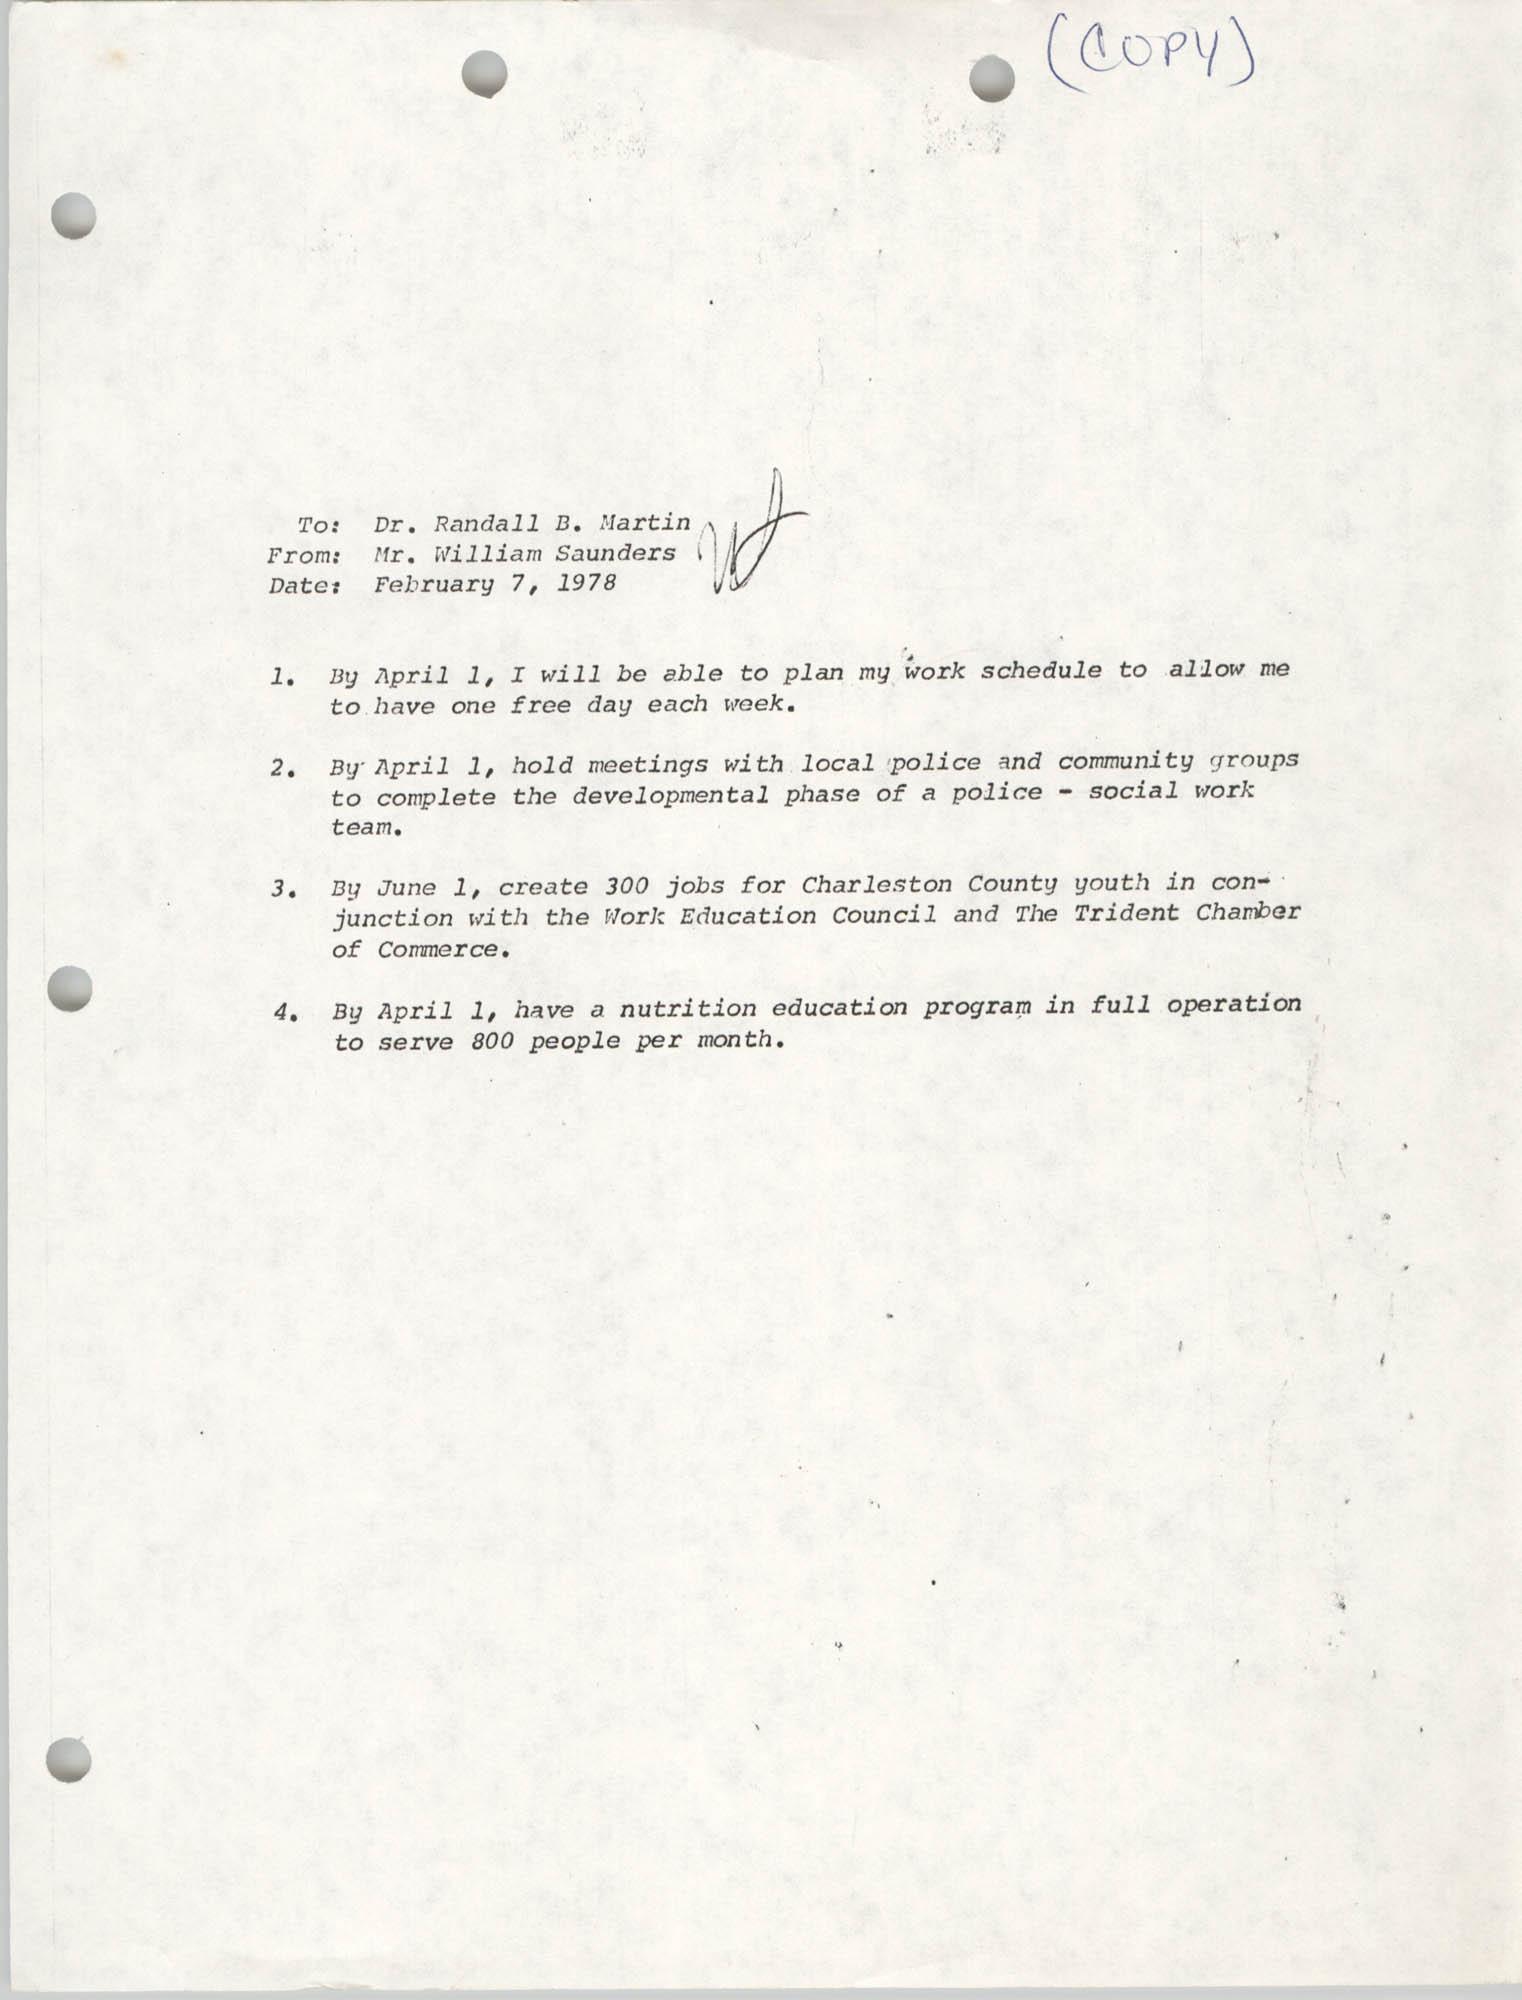 COBRA Memorandum, February 7, 1978